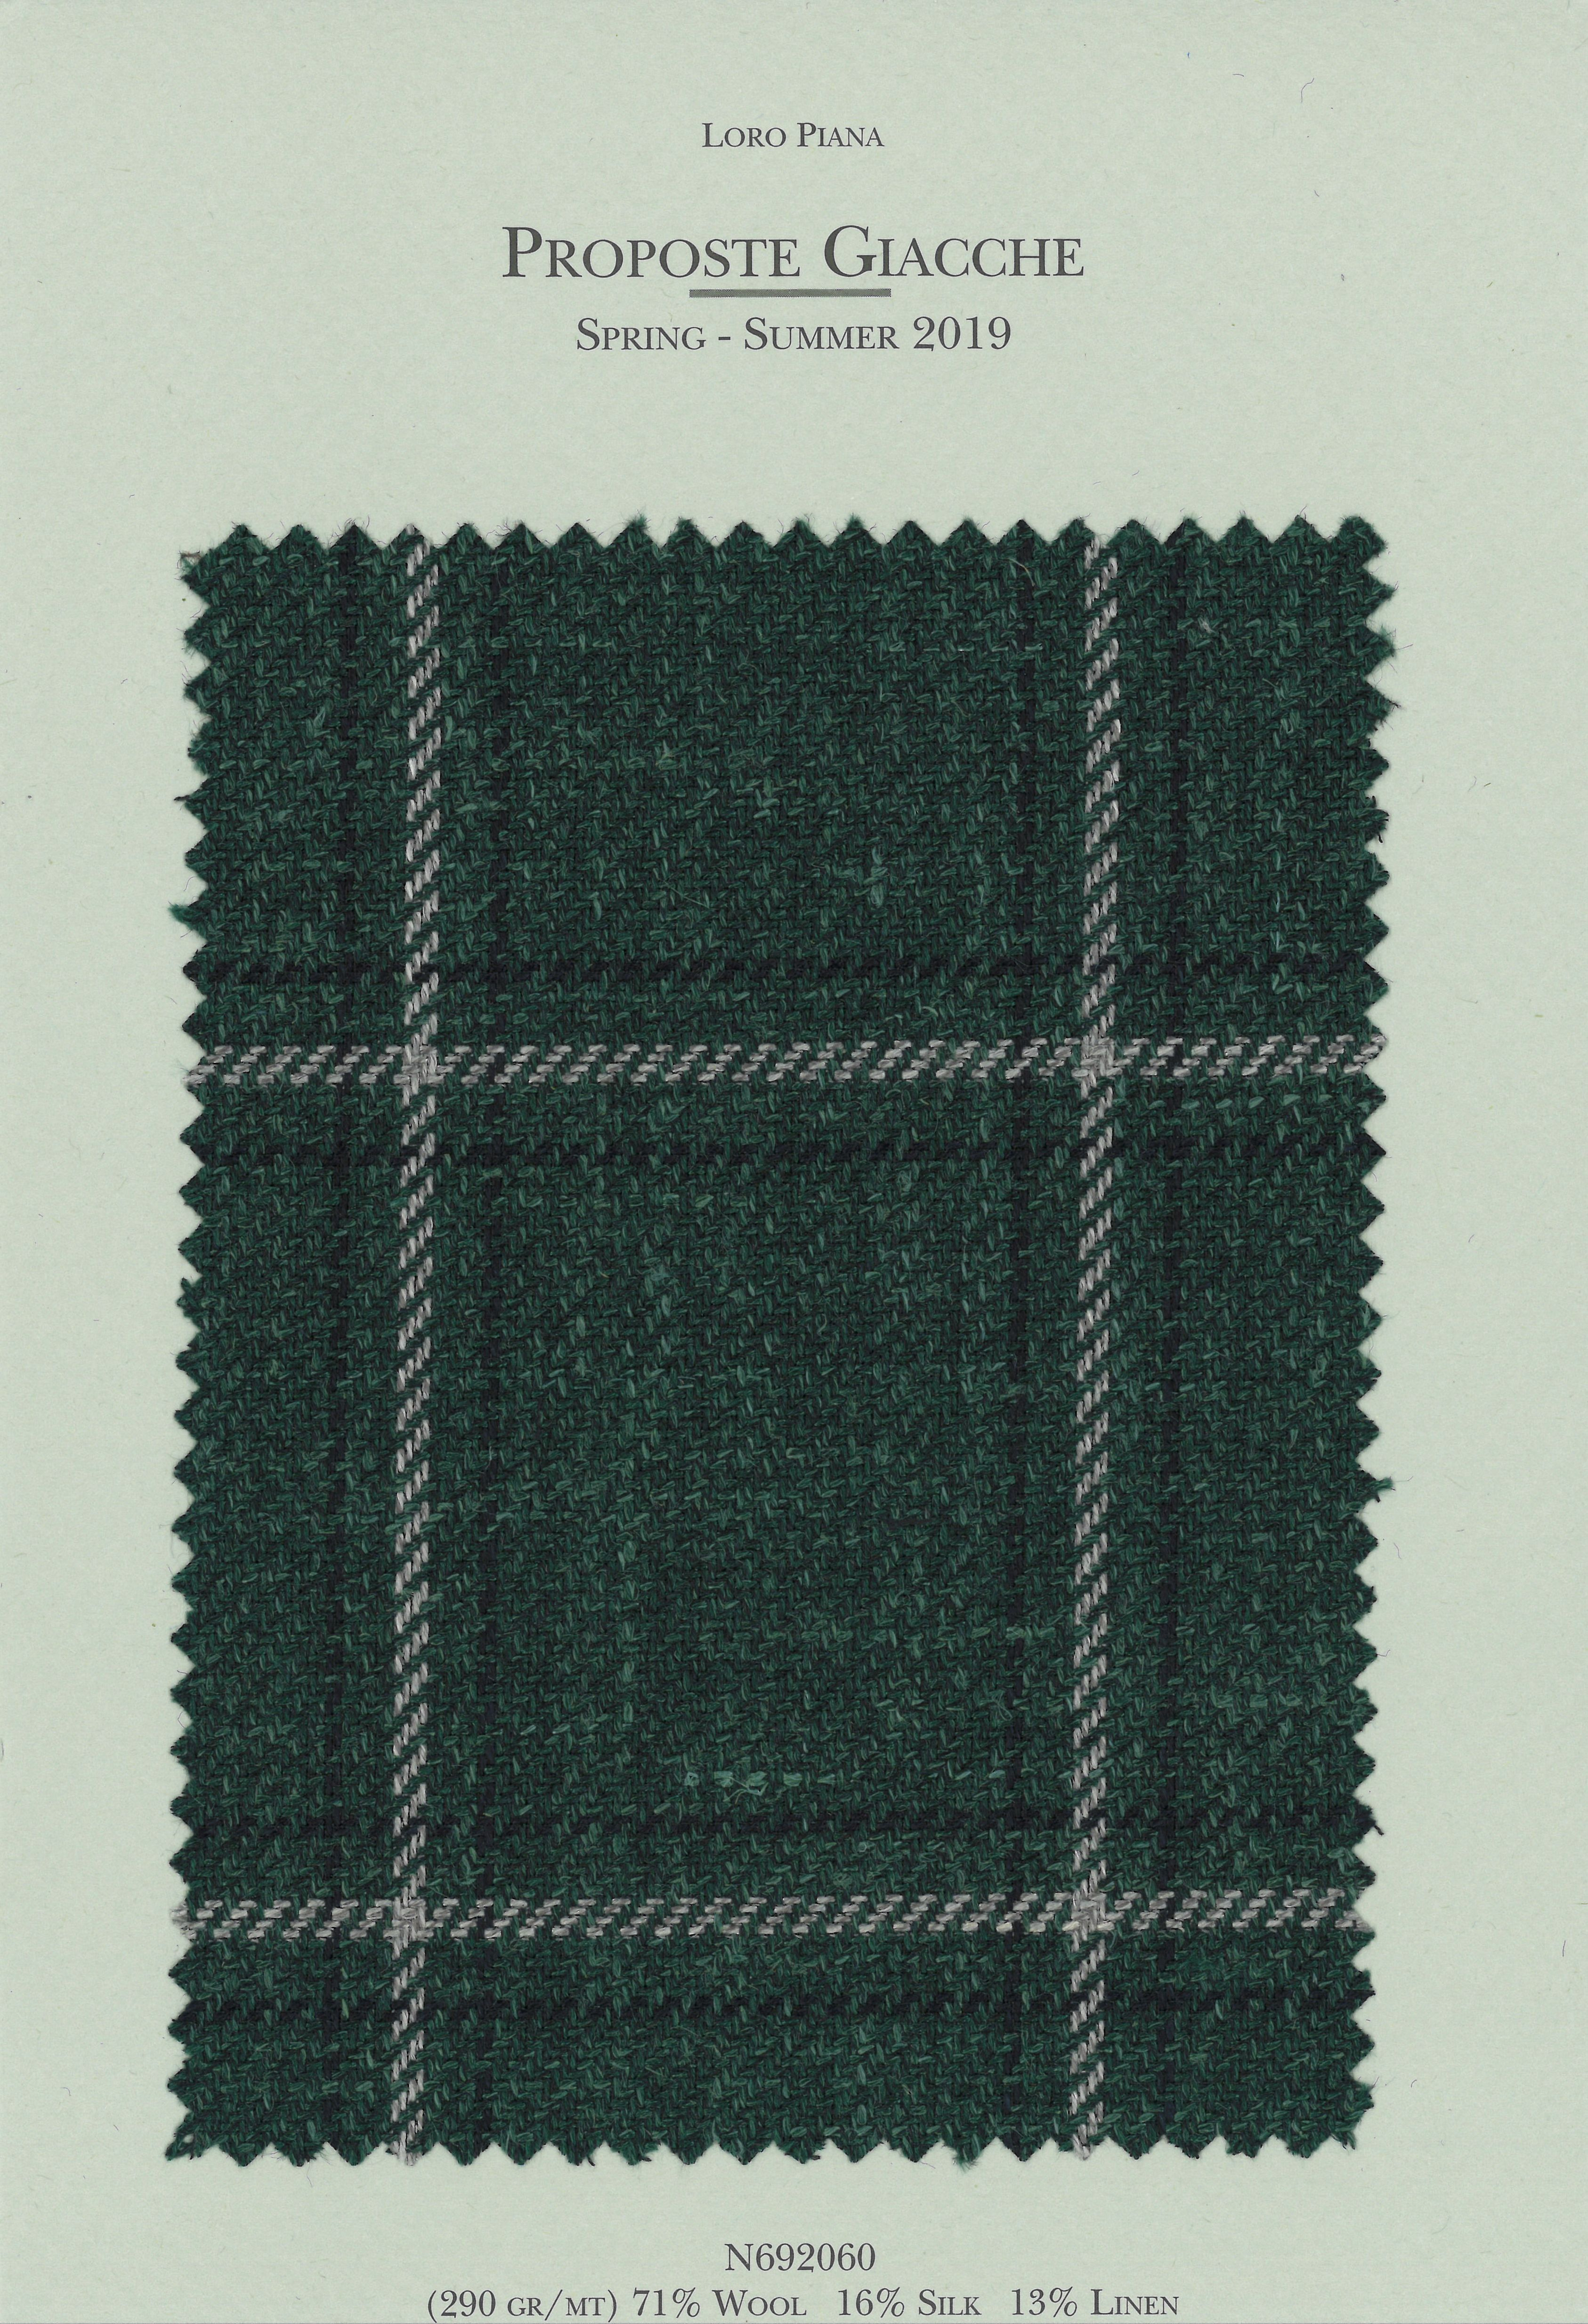 N692060